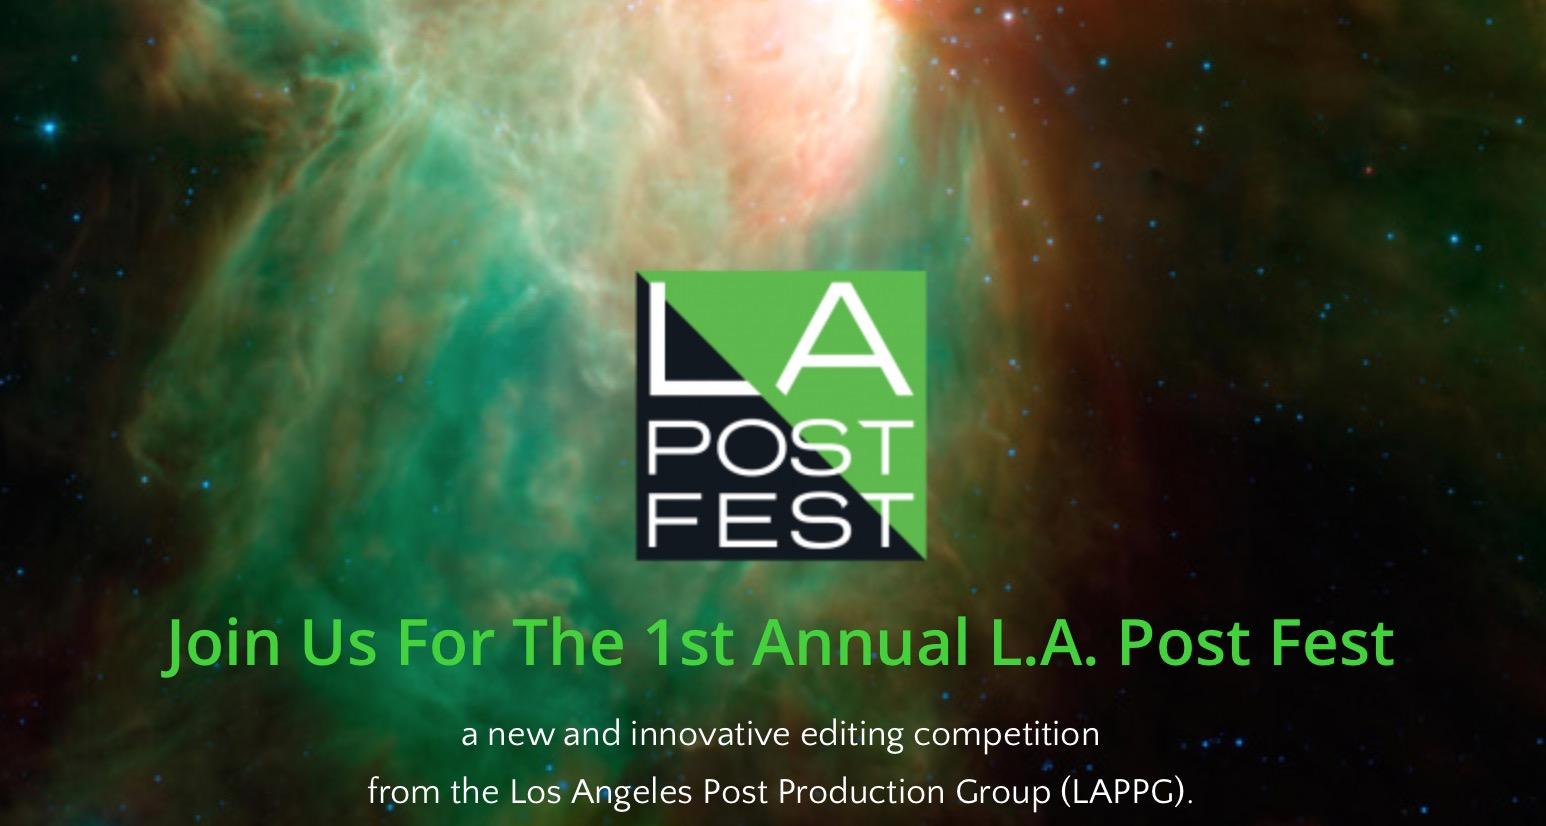 LApostfest